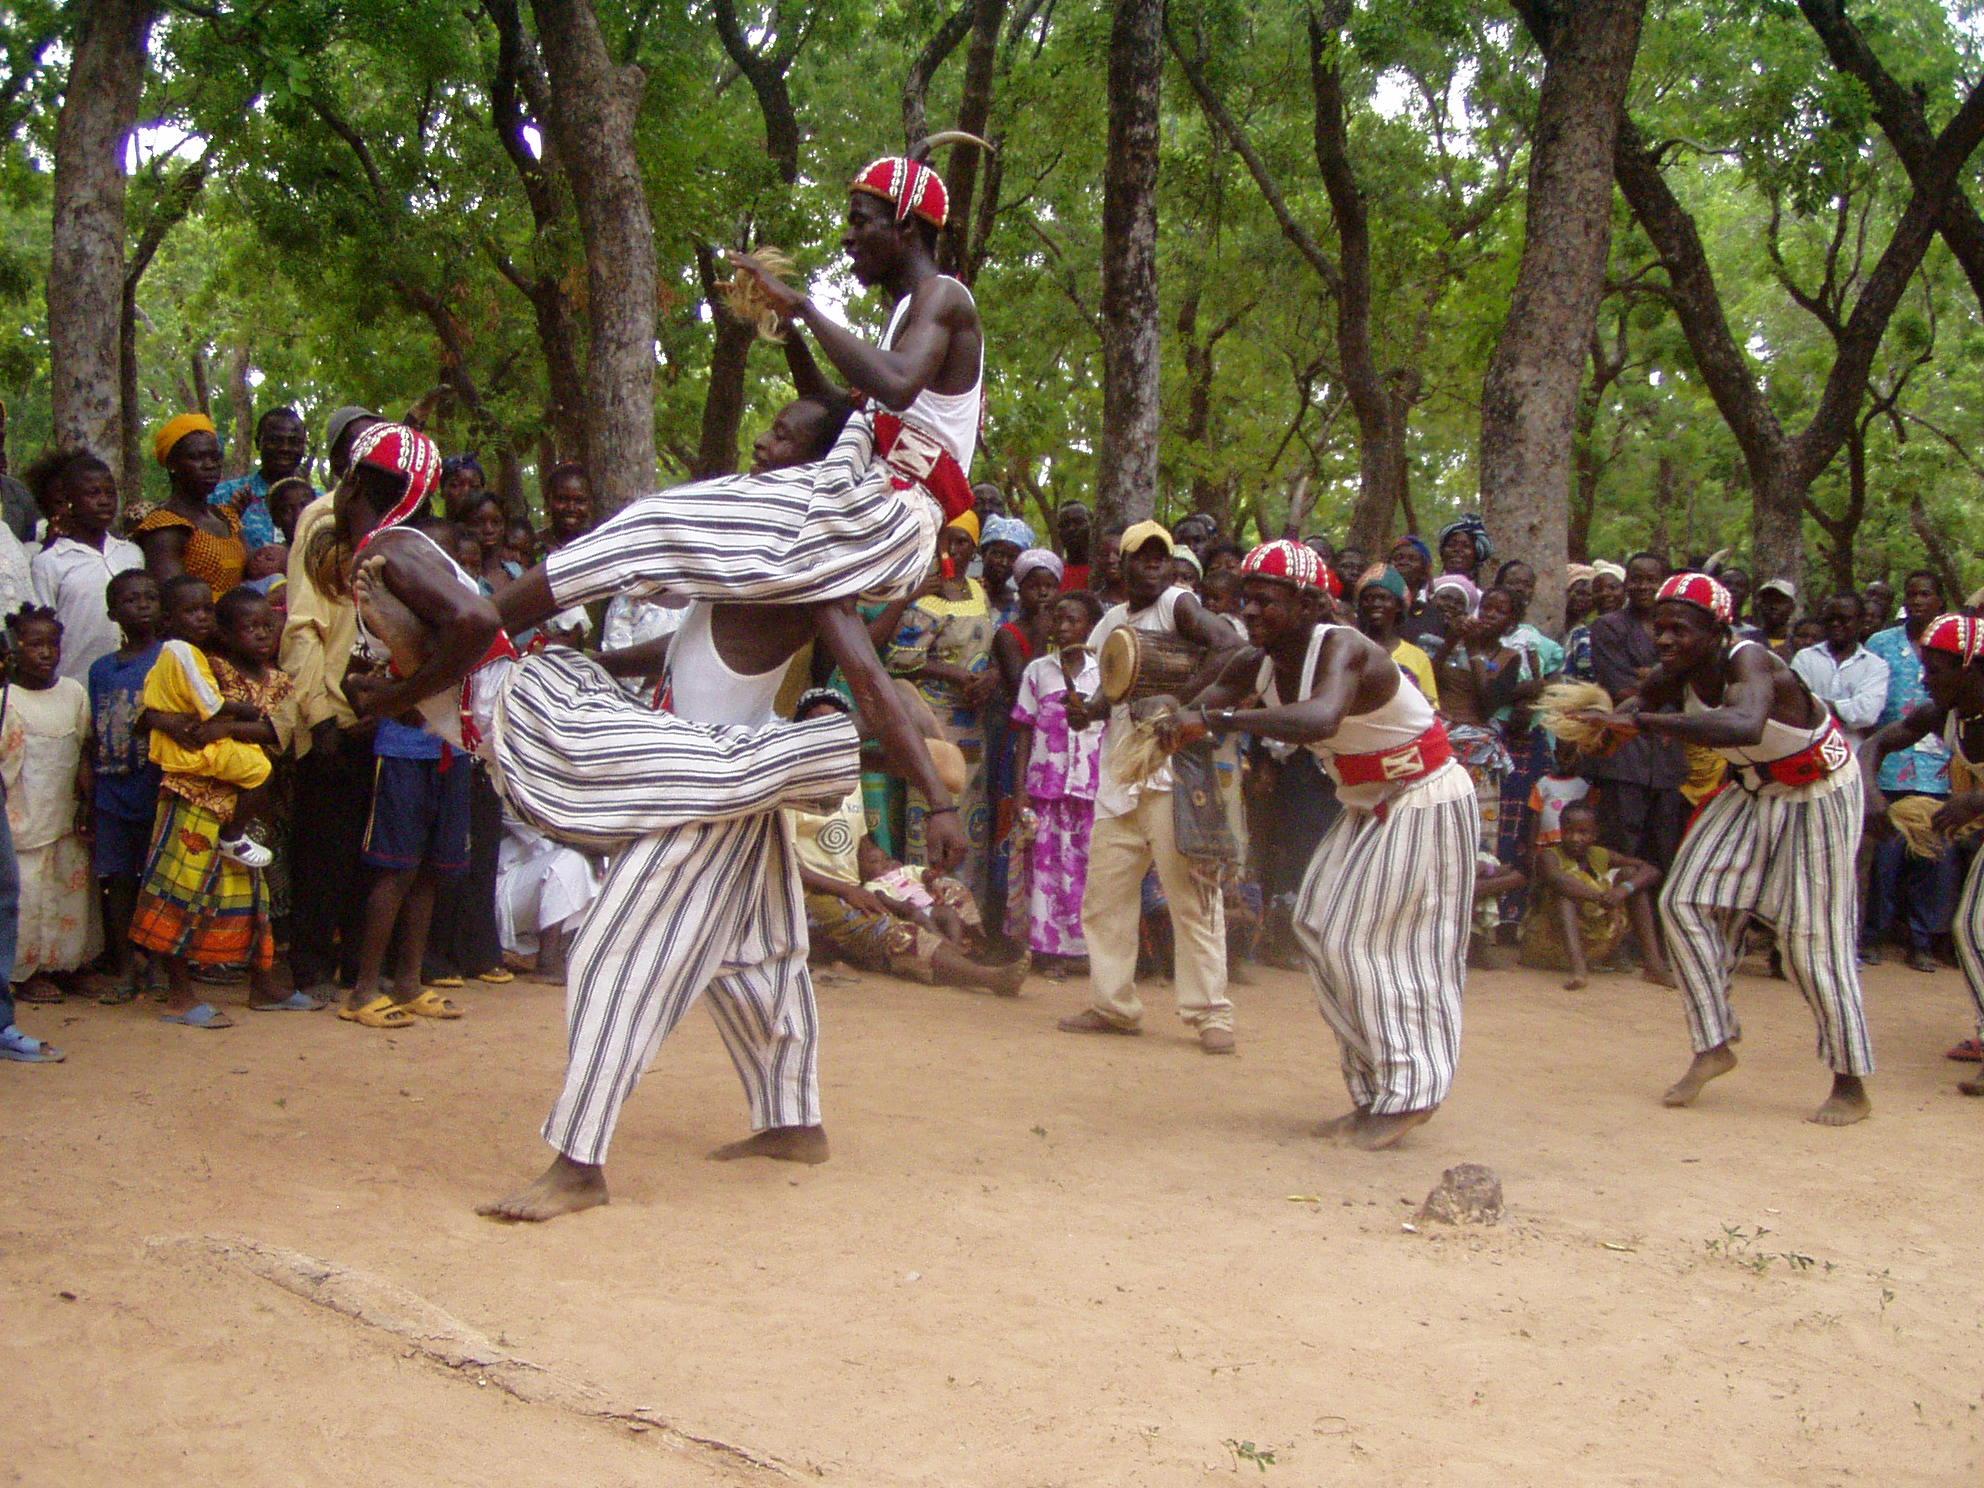 Acrobacie des danseurs kassena. Kassena dancing acrobacy.